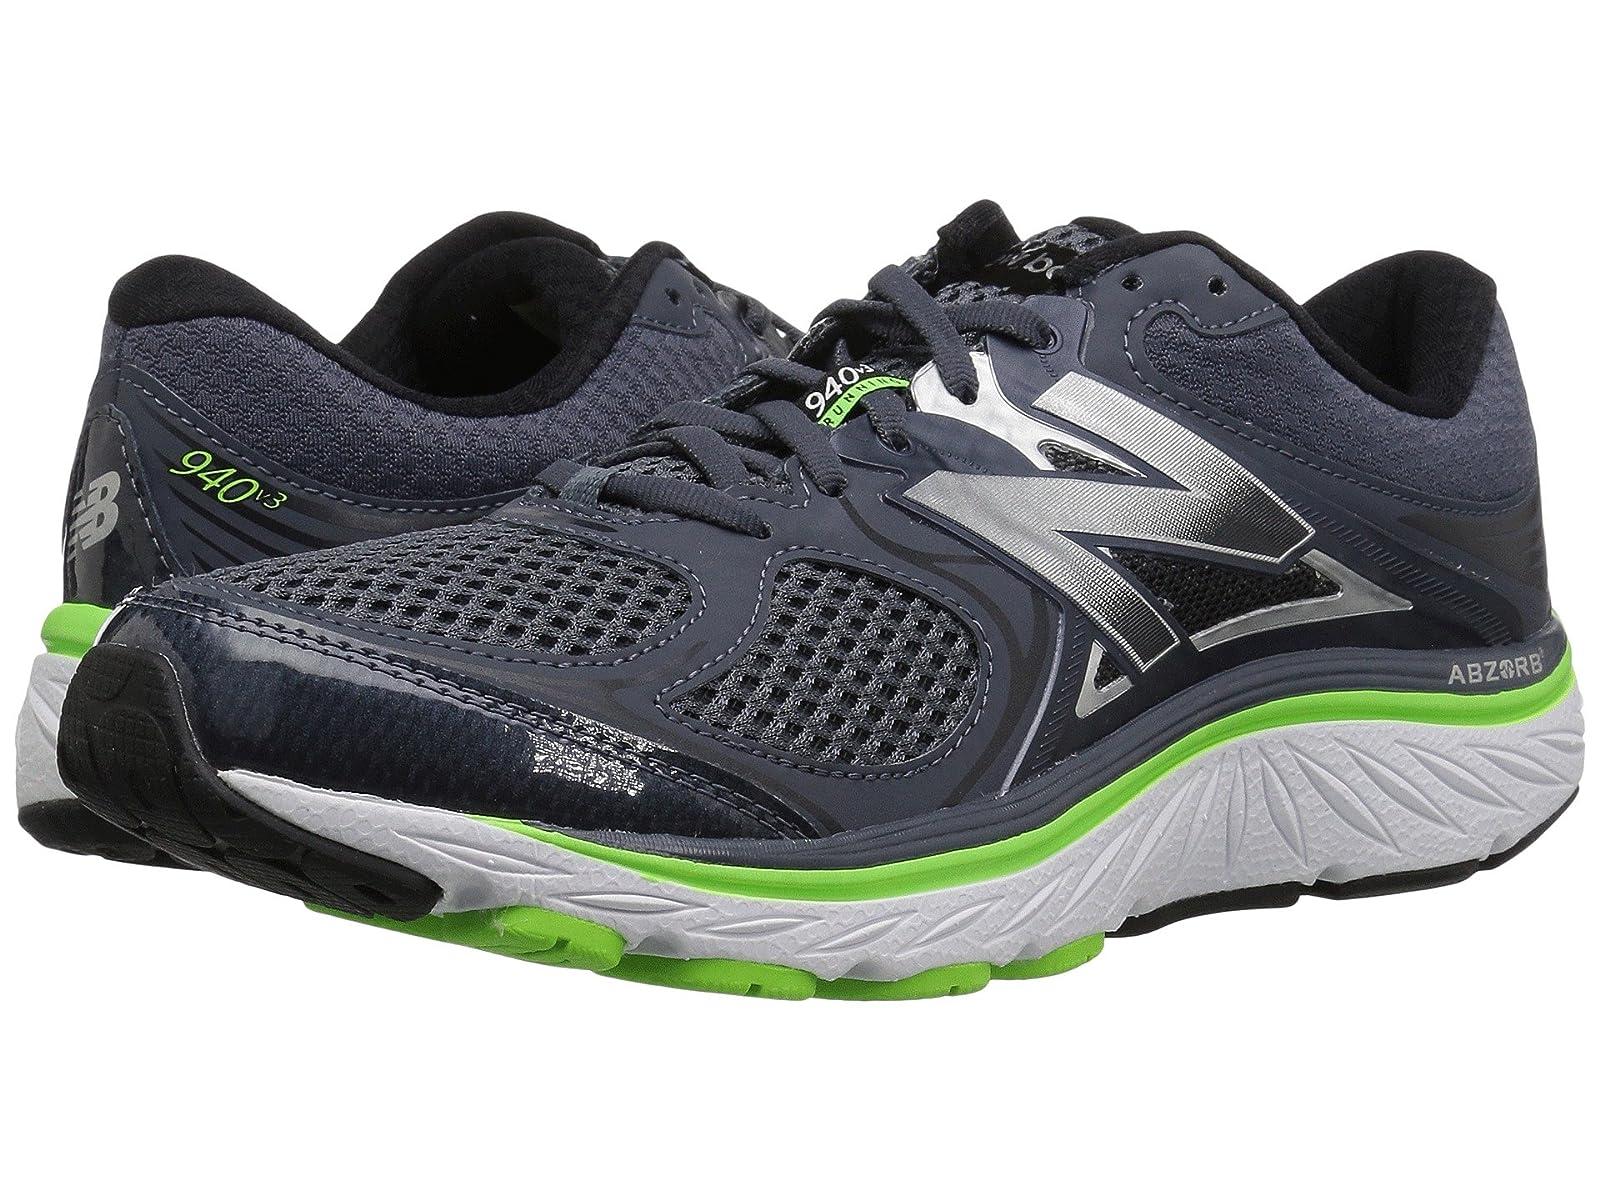 New Balance 940v3Atmospheric grades have affordable shoes